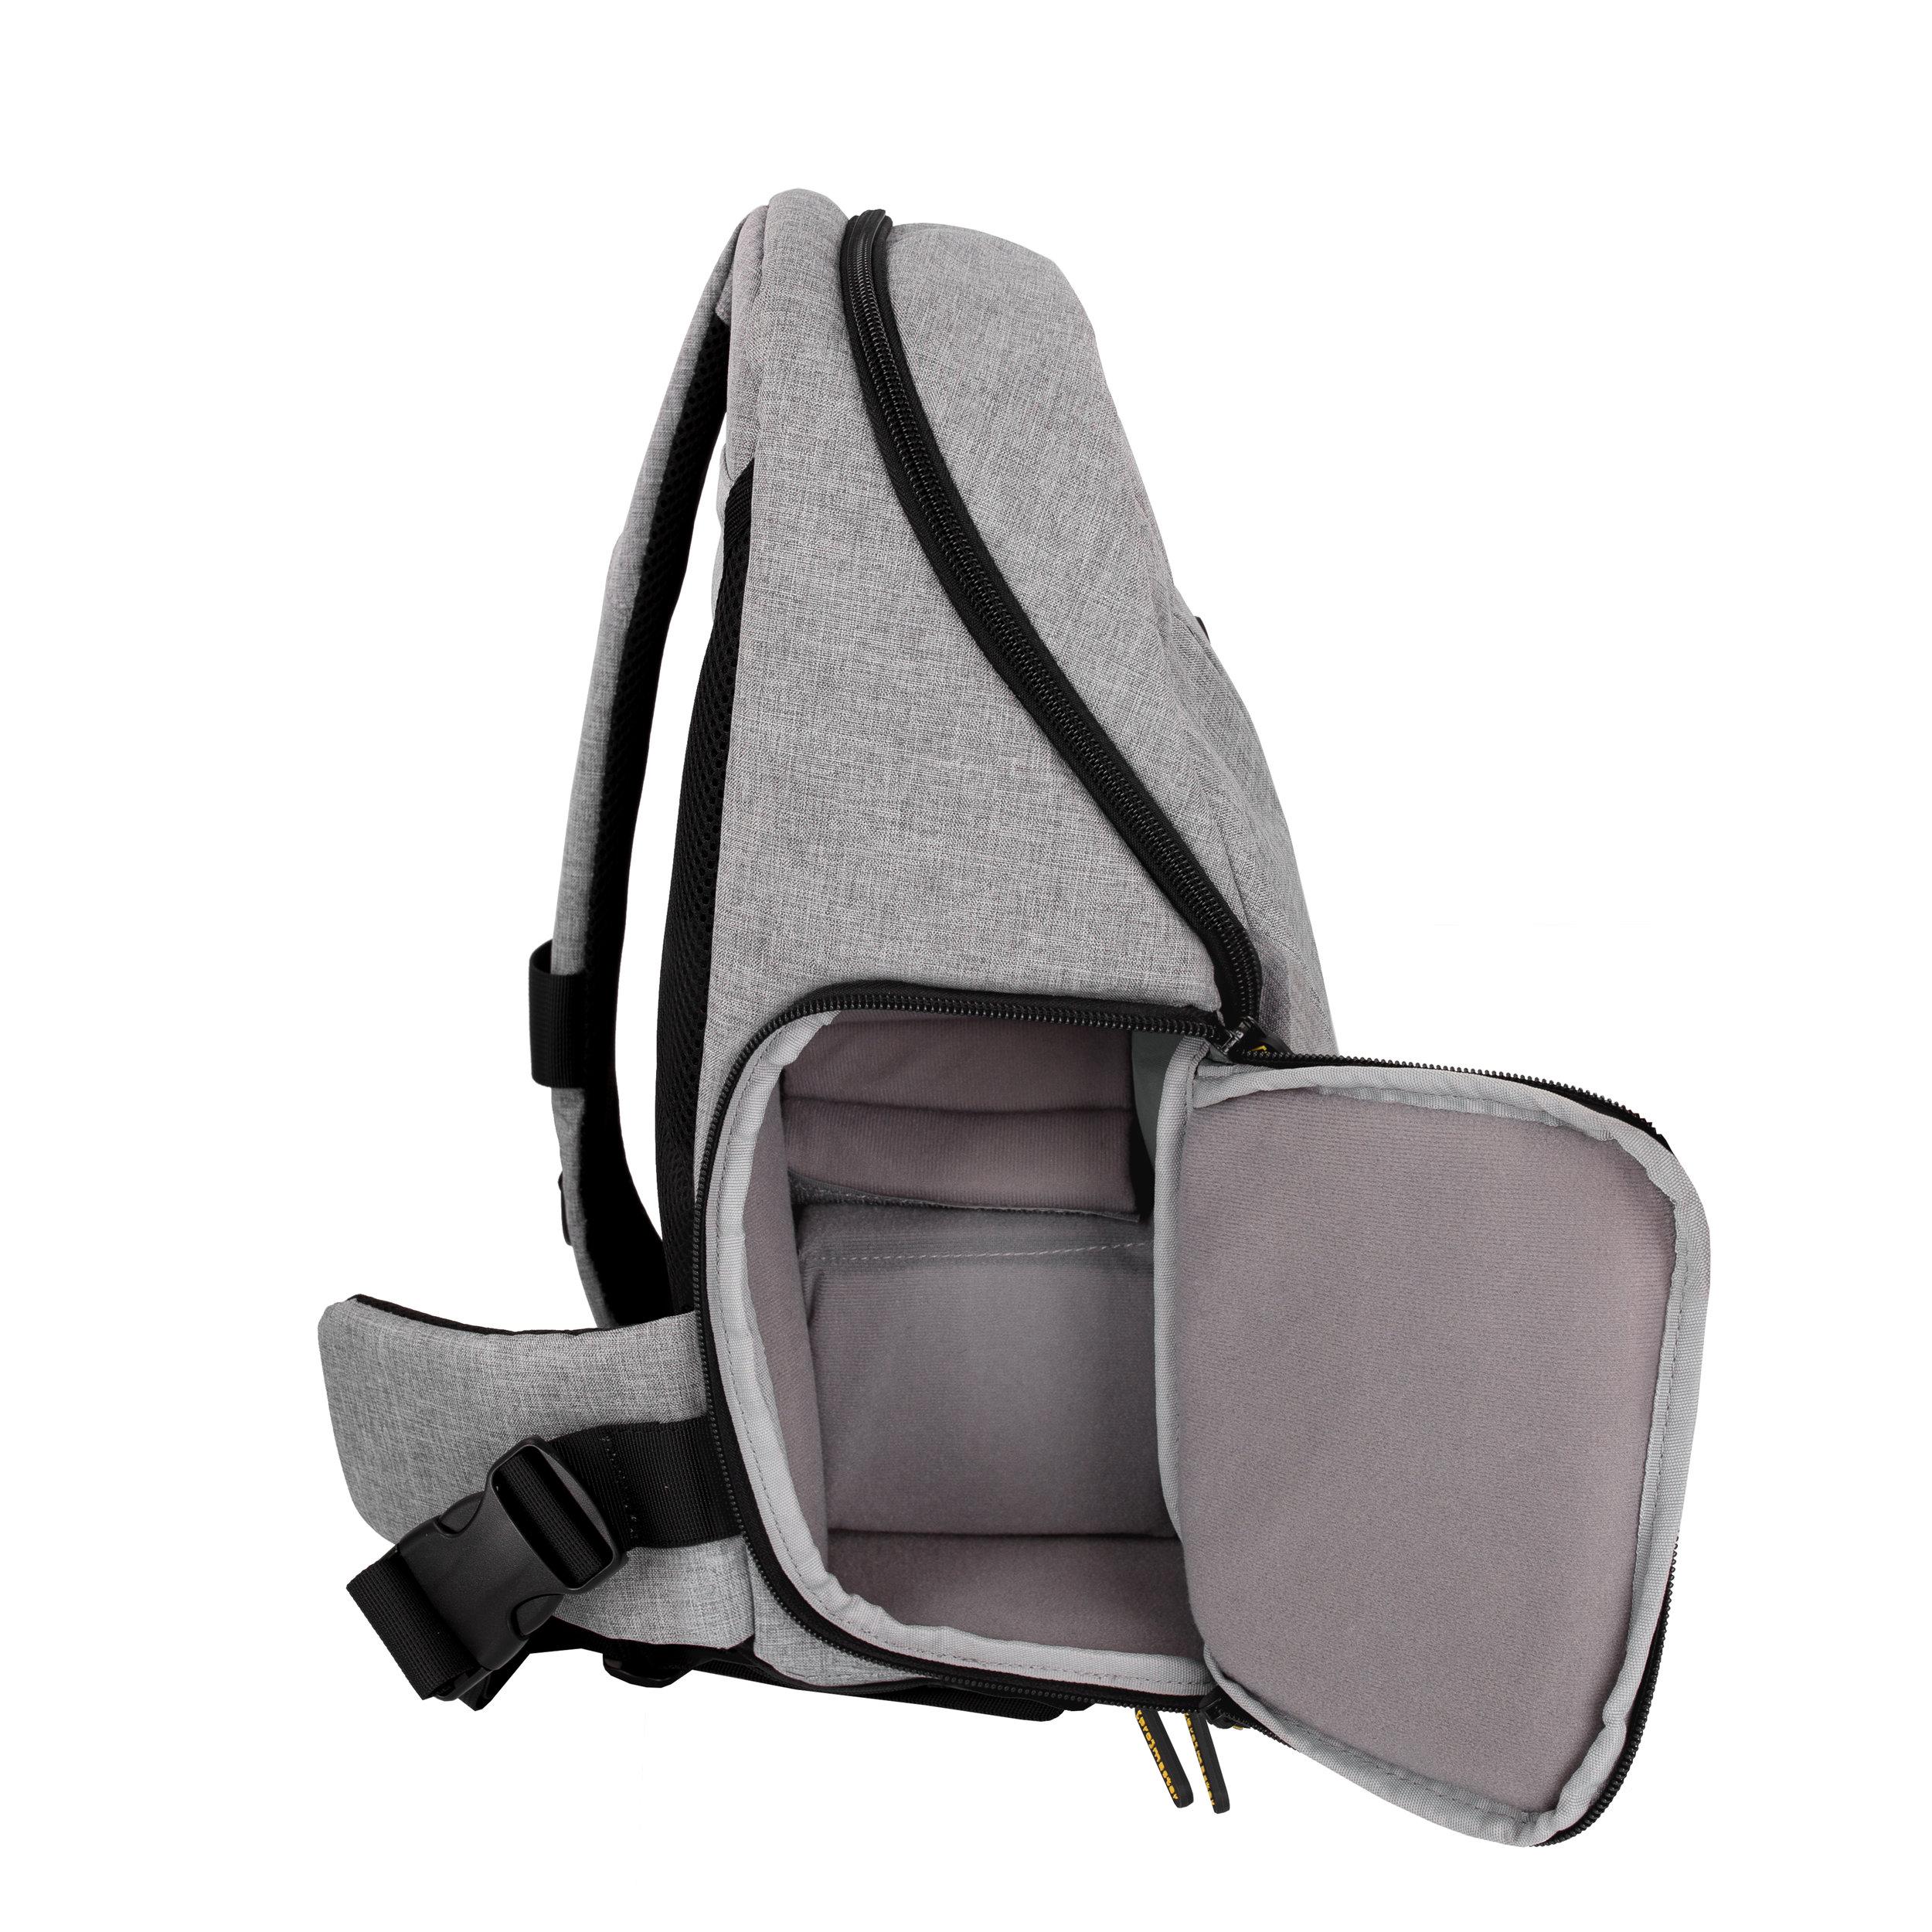 Promaster Impulse Sling Bag Grey Large Richmond Camera